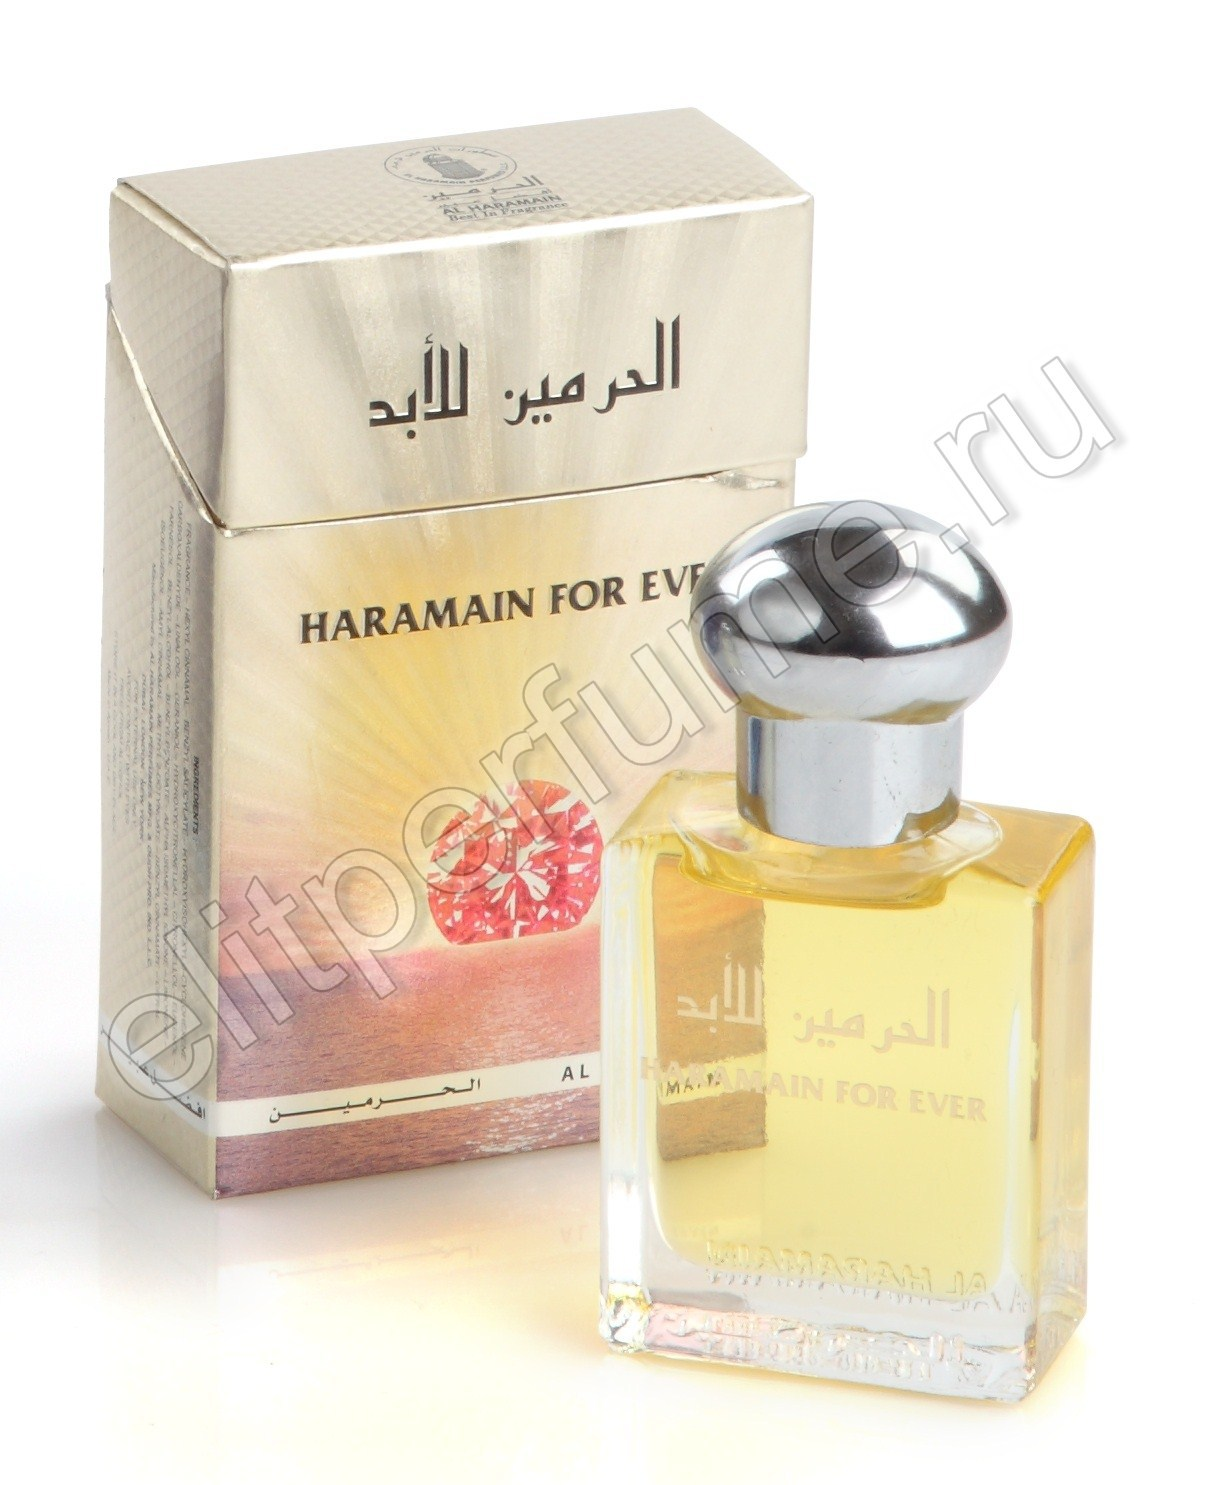 Пробники для духов Харамайн Навсегда Haramain Forever 1 мл арабские масляные духи от Аль Харамайн Al Haramin Perfumes